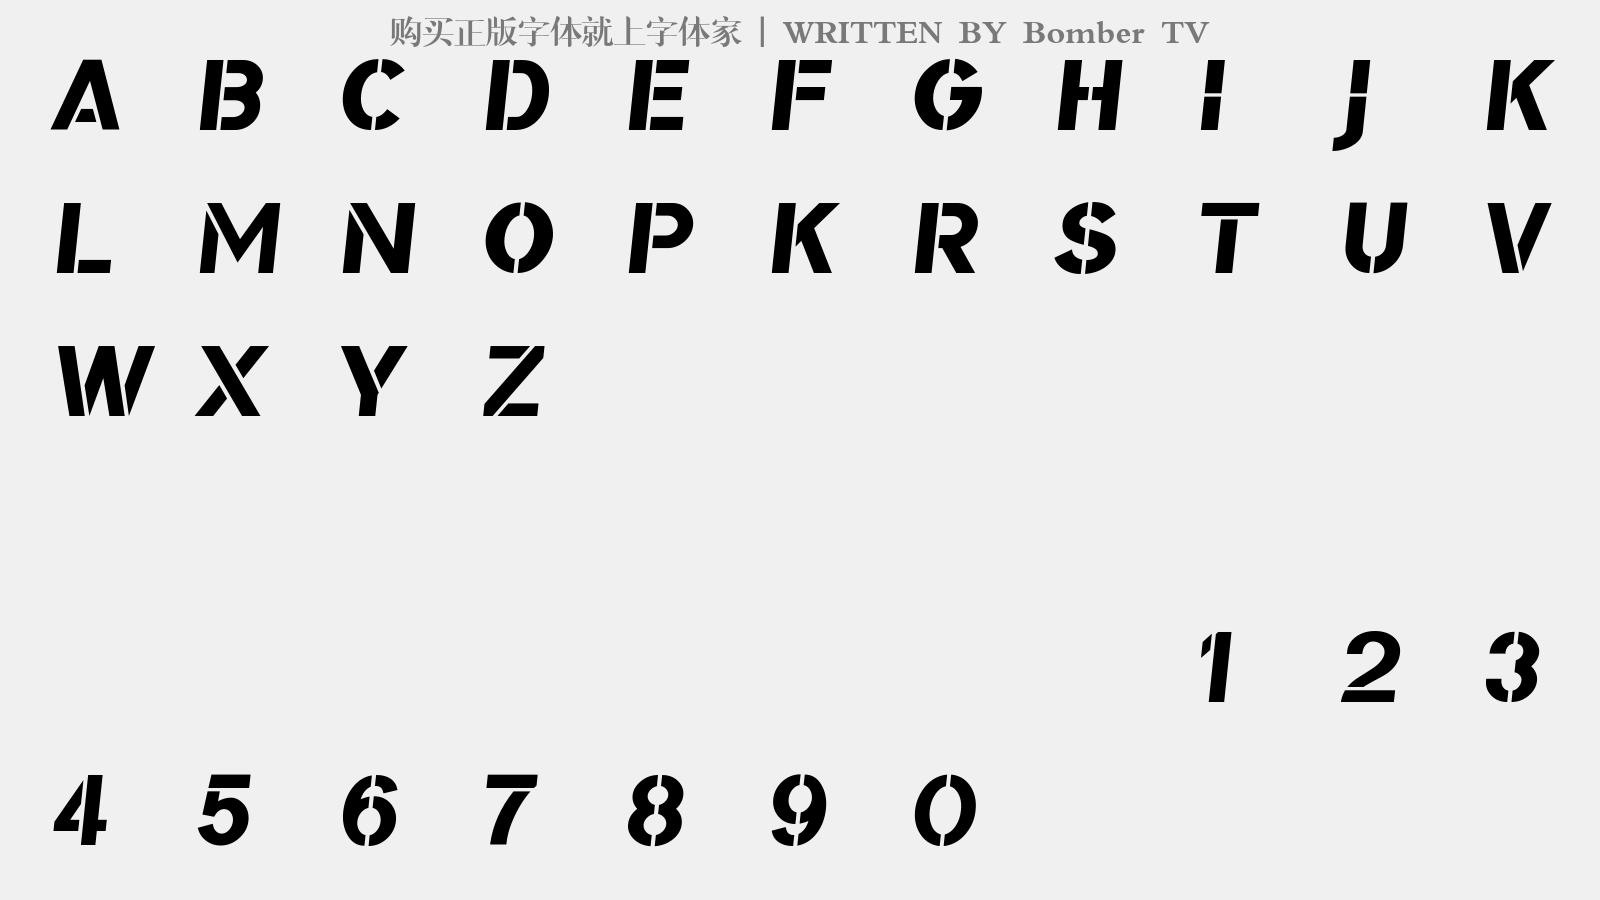 Bomber TV - 大寫字母/小寫字母/數字